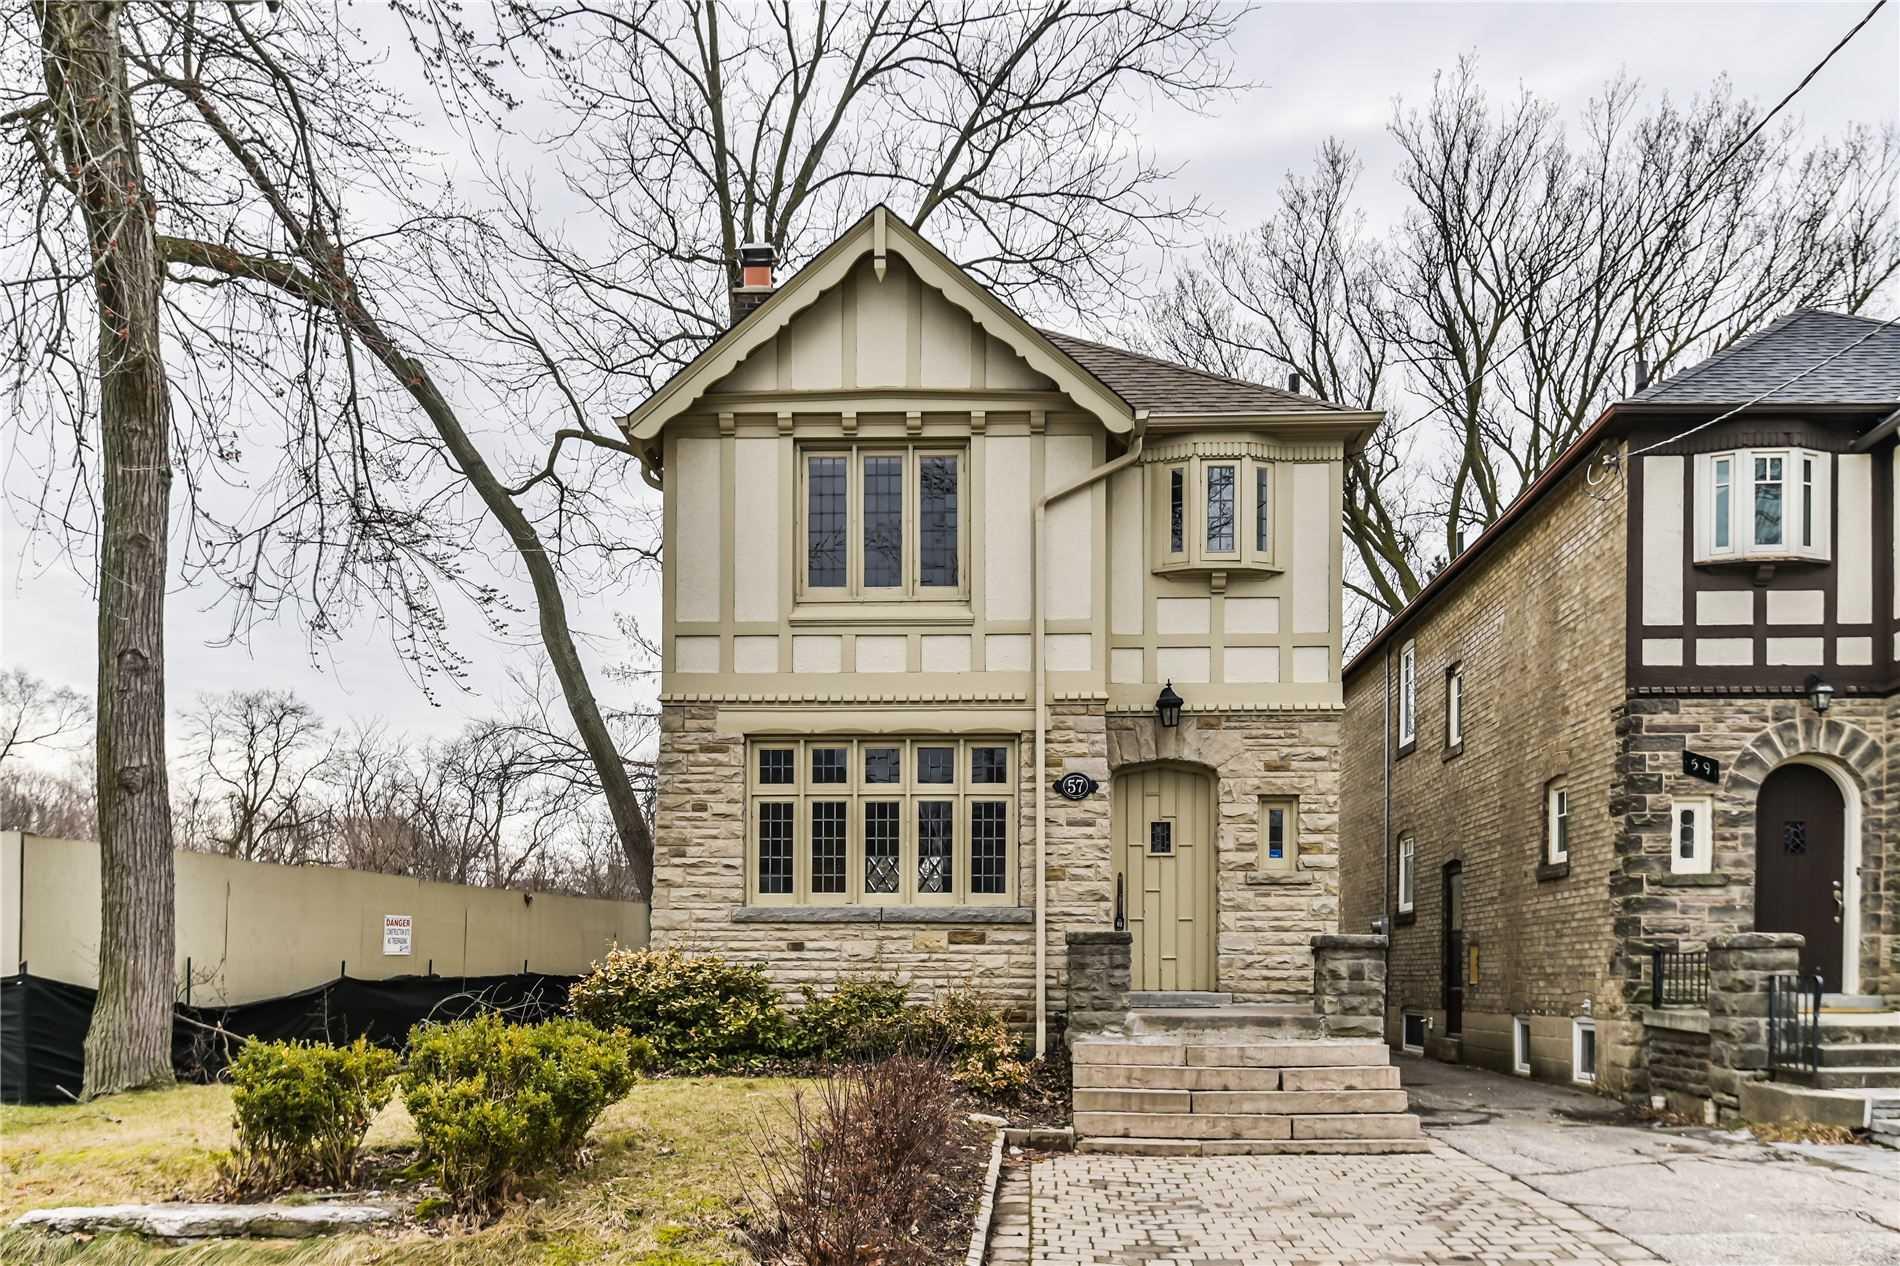 57 Chatsworth Dr, Toronto, M4R1R6